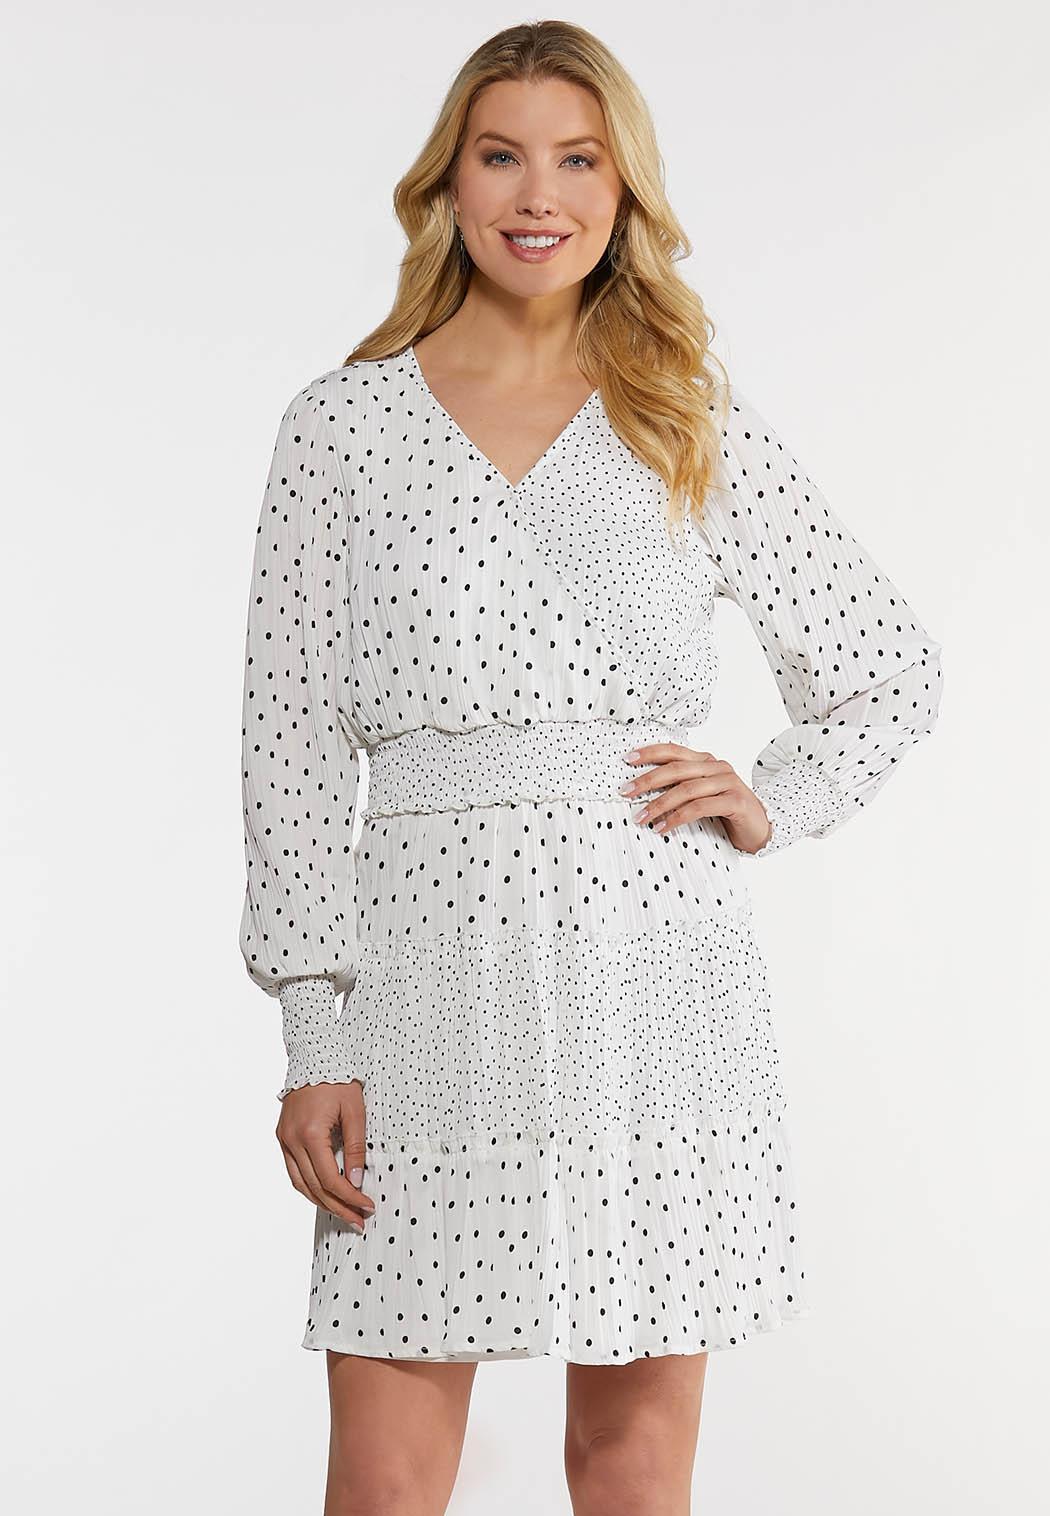 Black White Dotted Smocked Dress